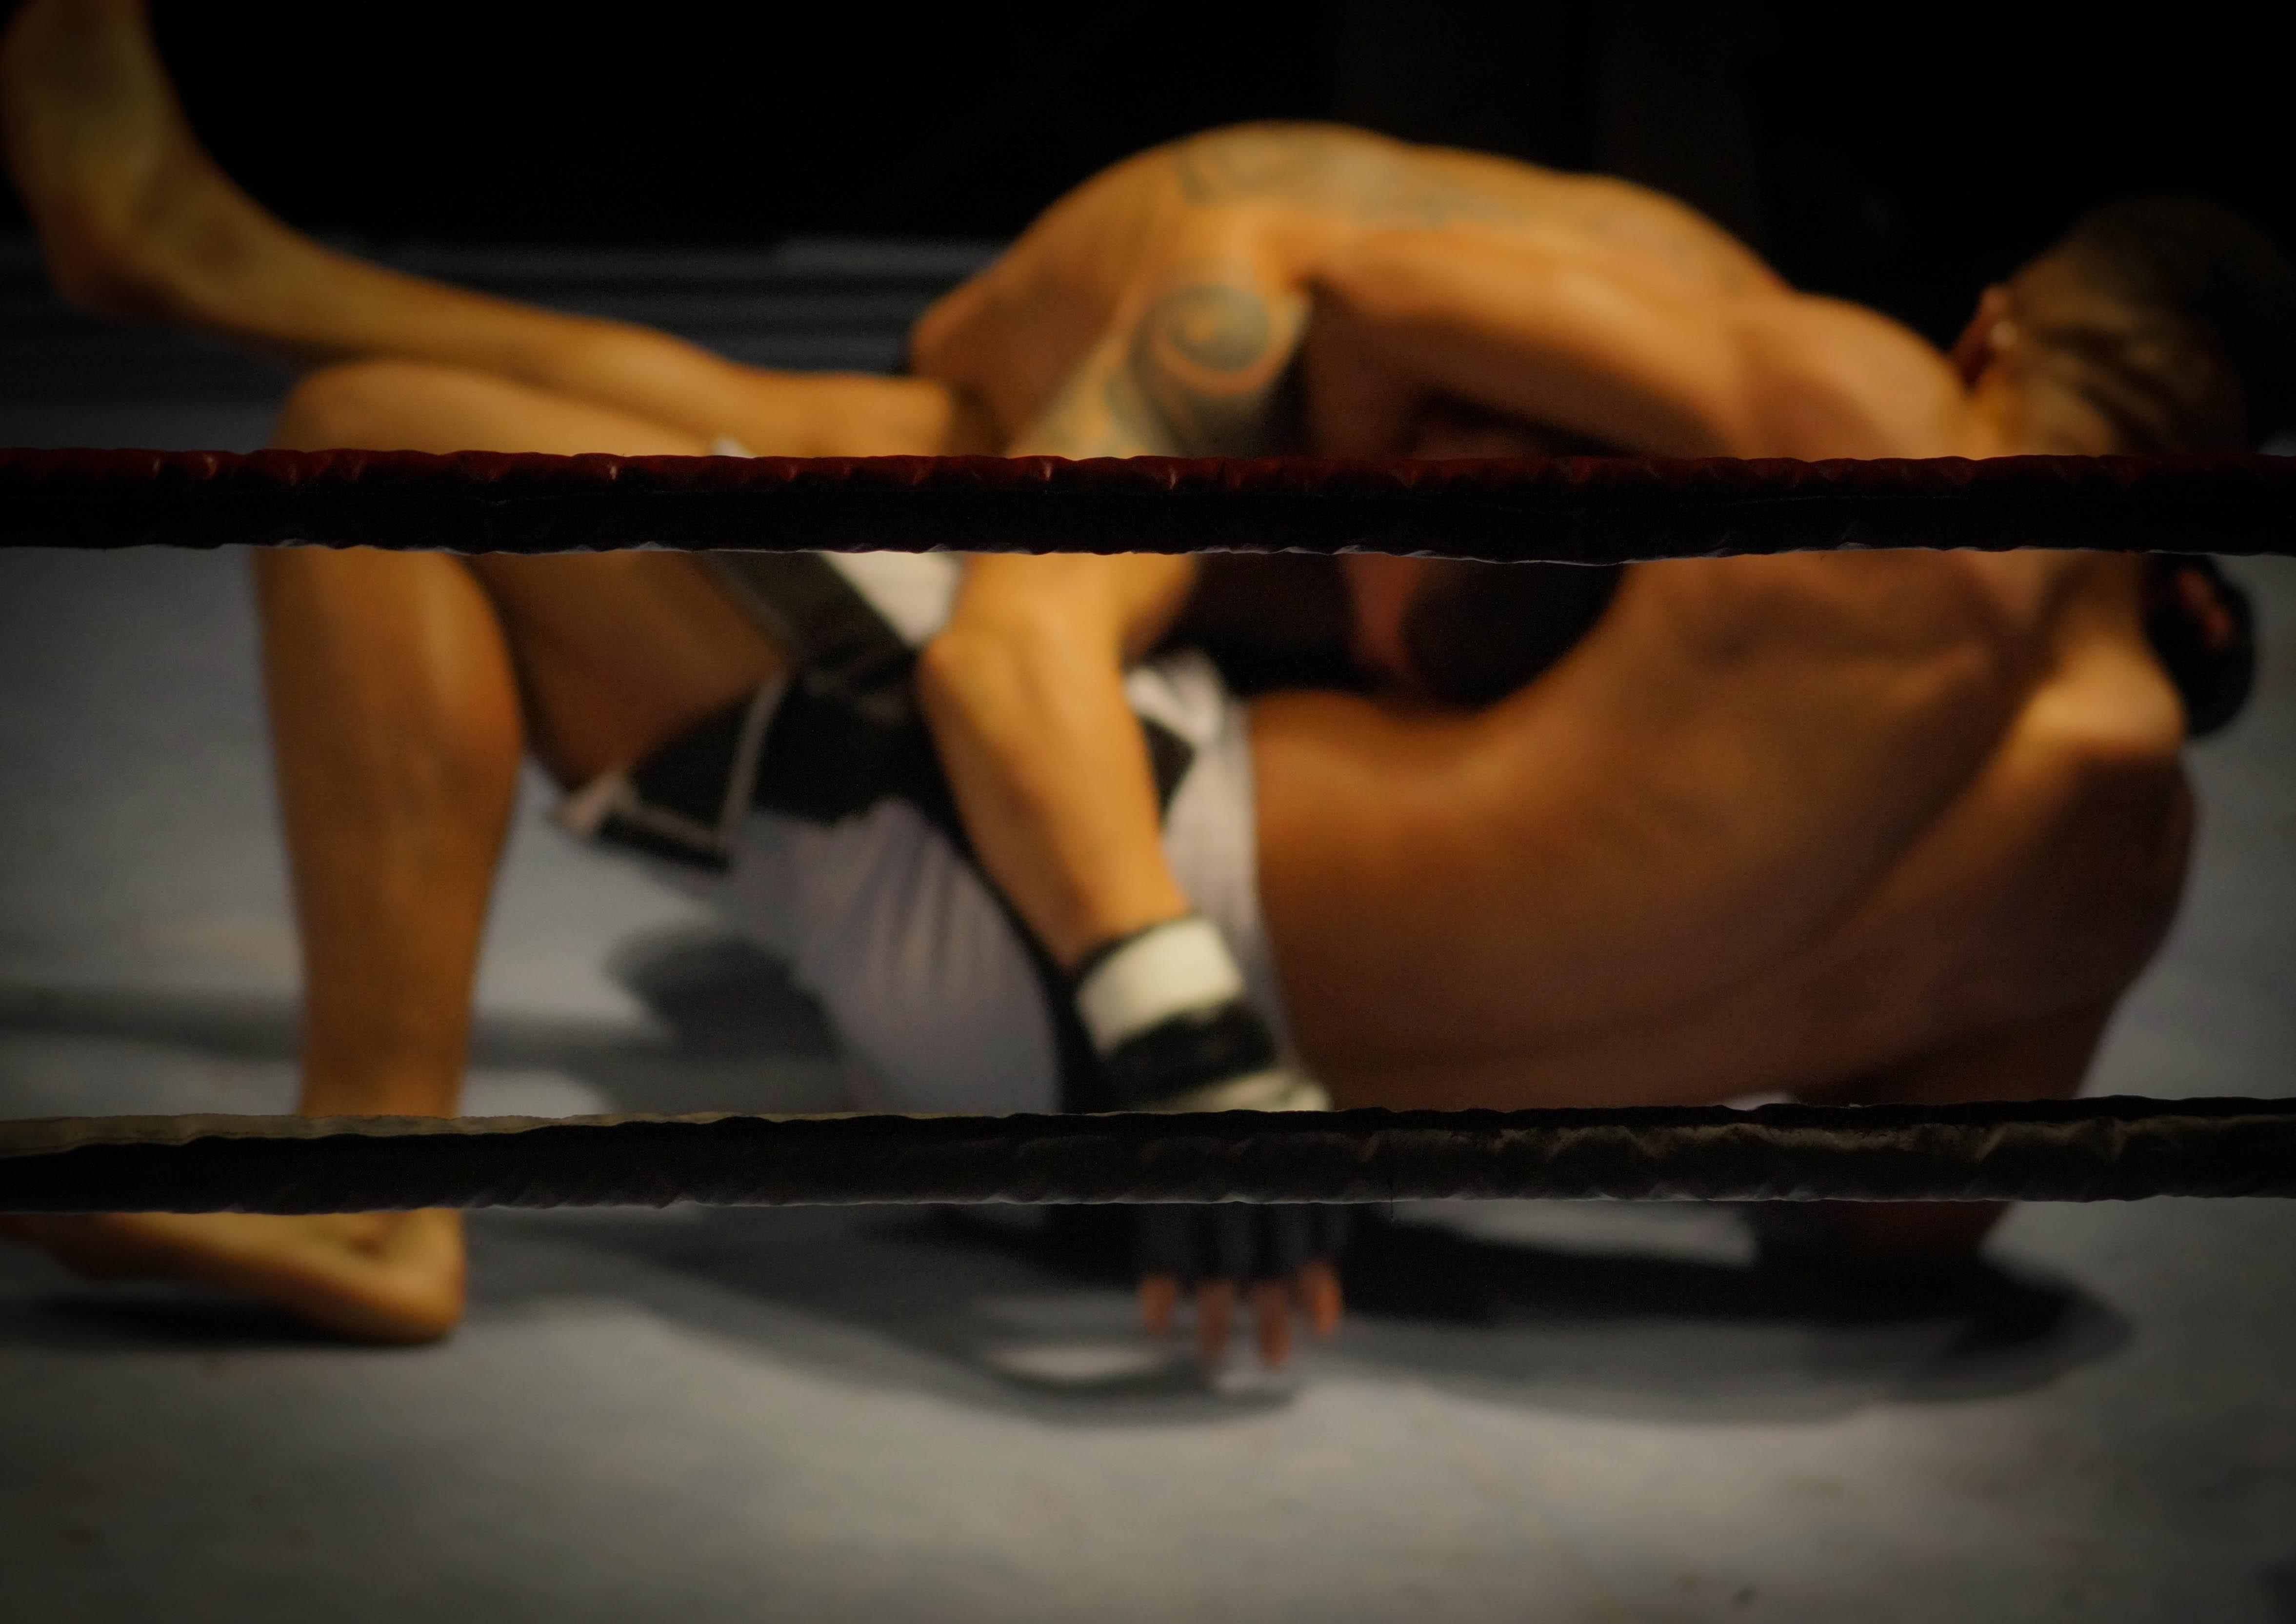 Wrestling ring photo